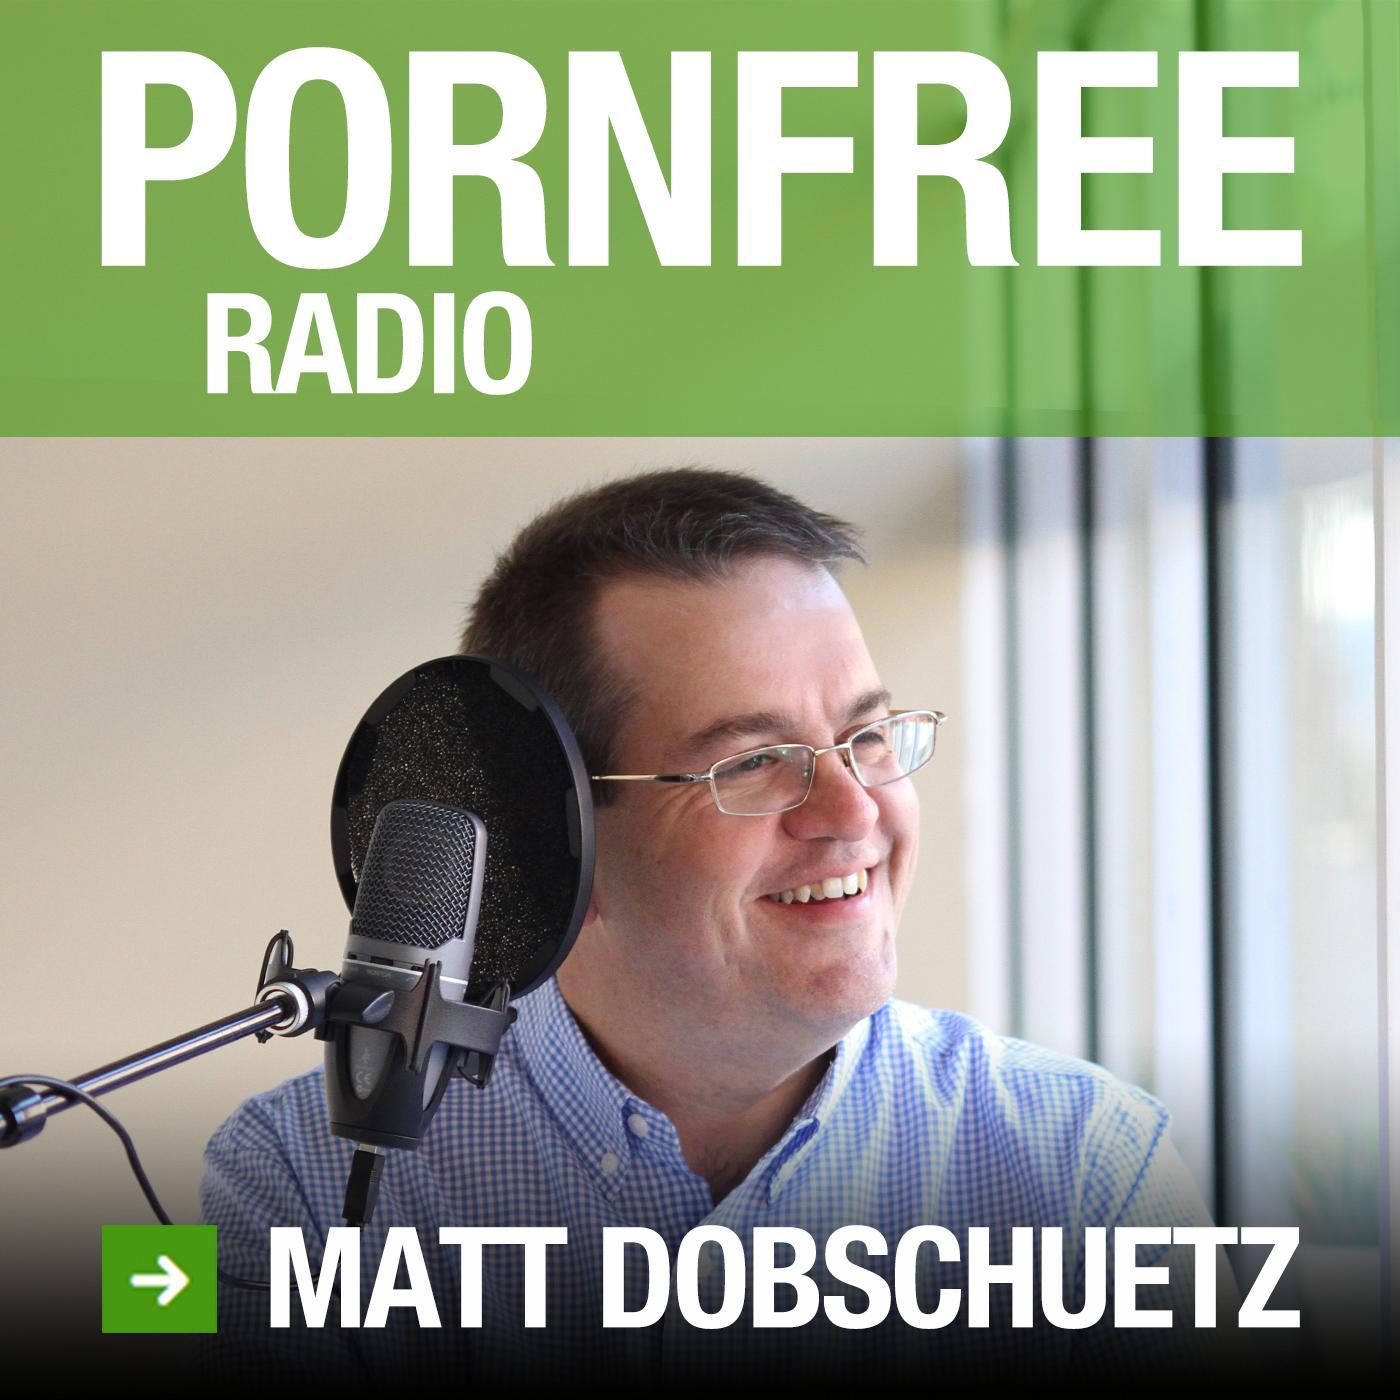 233 - Pure Desire Podcast with Nick Stumbo and Trevor Winsor